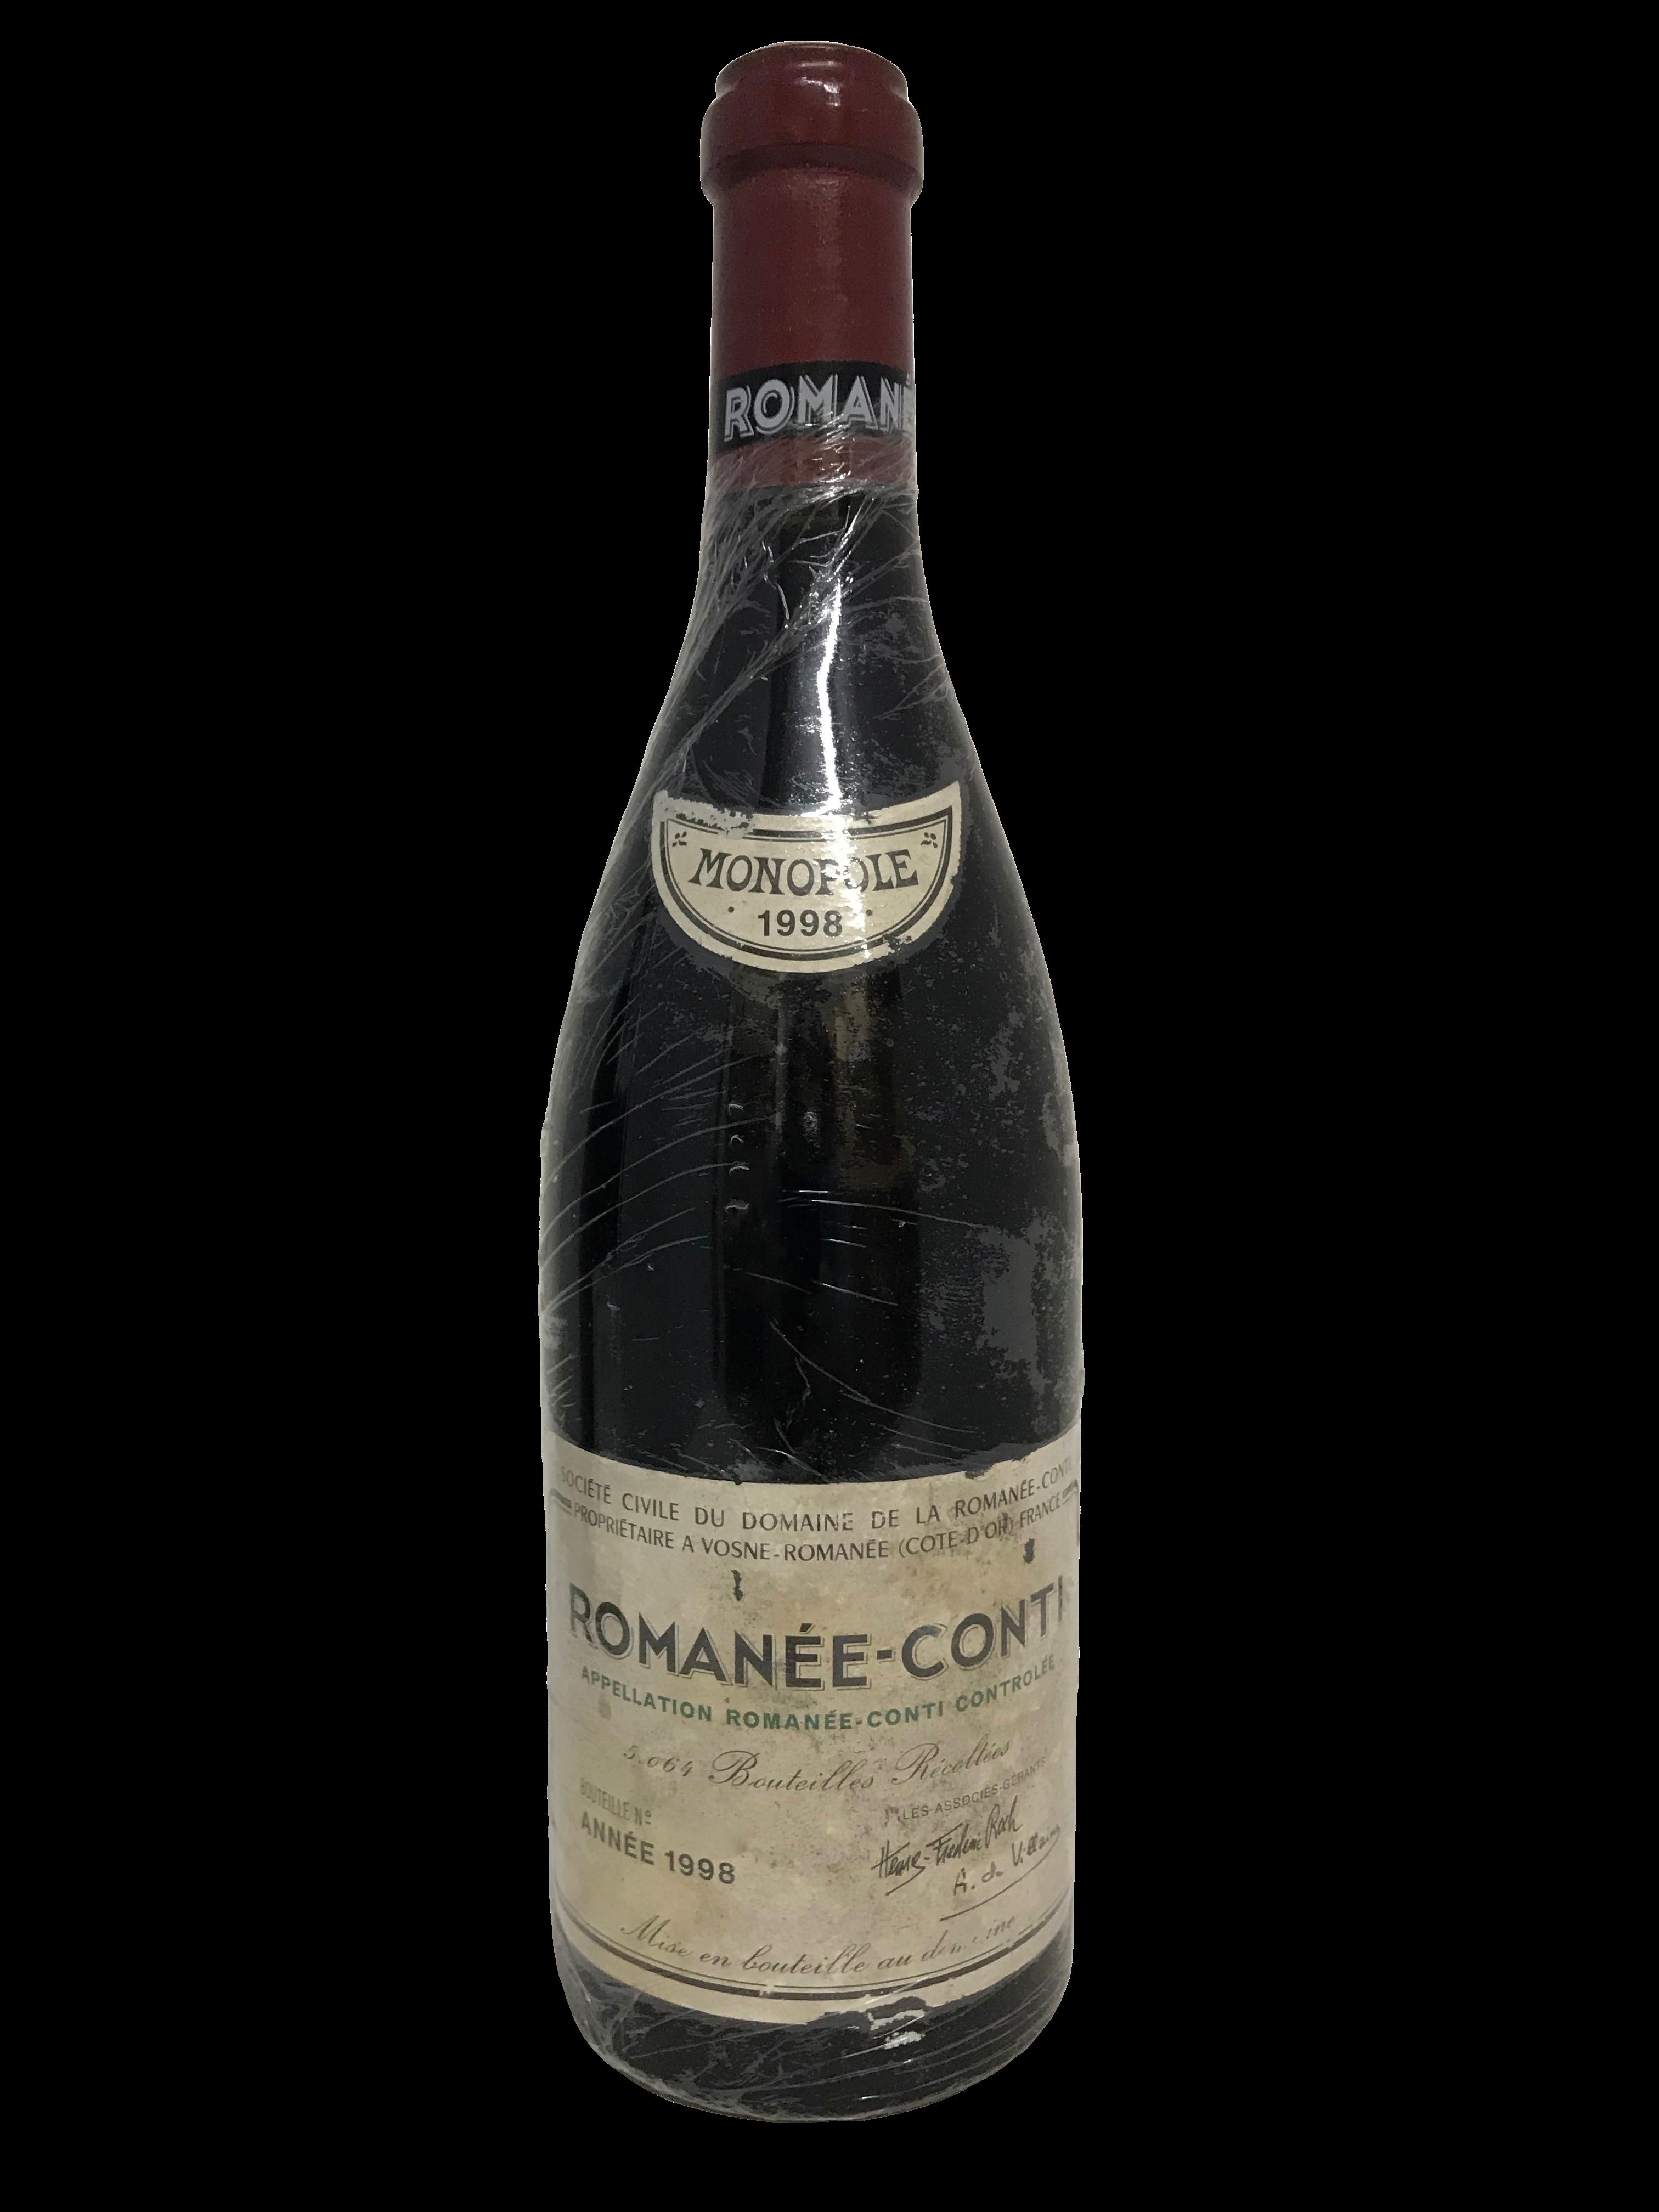 Domaine de la Romanée-Conti (DRC) – Romanée-Conti 1998 (CBO1)